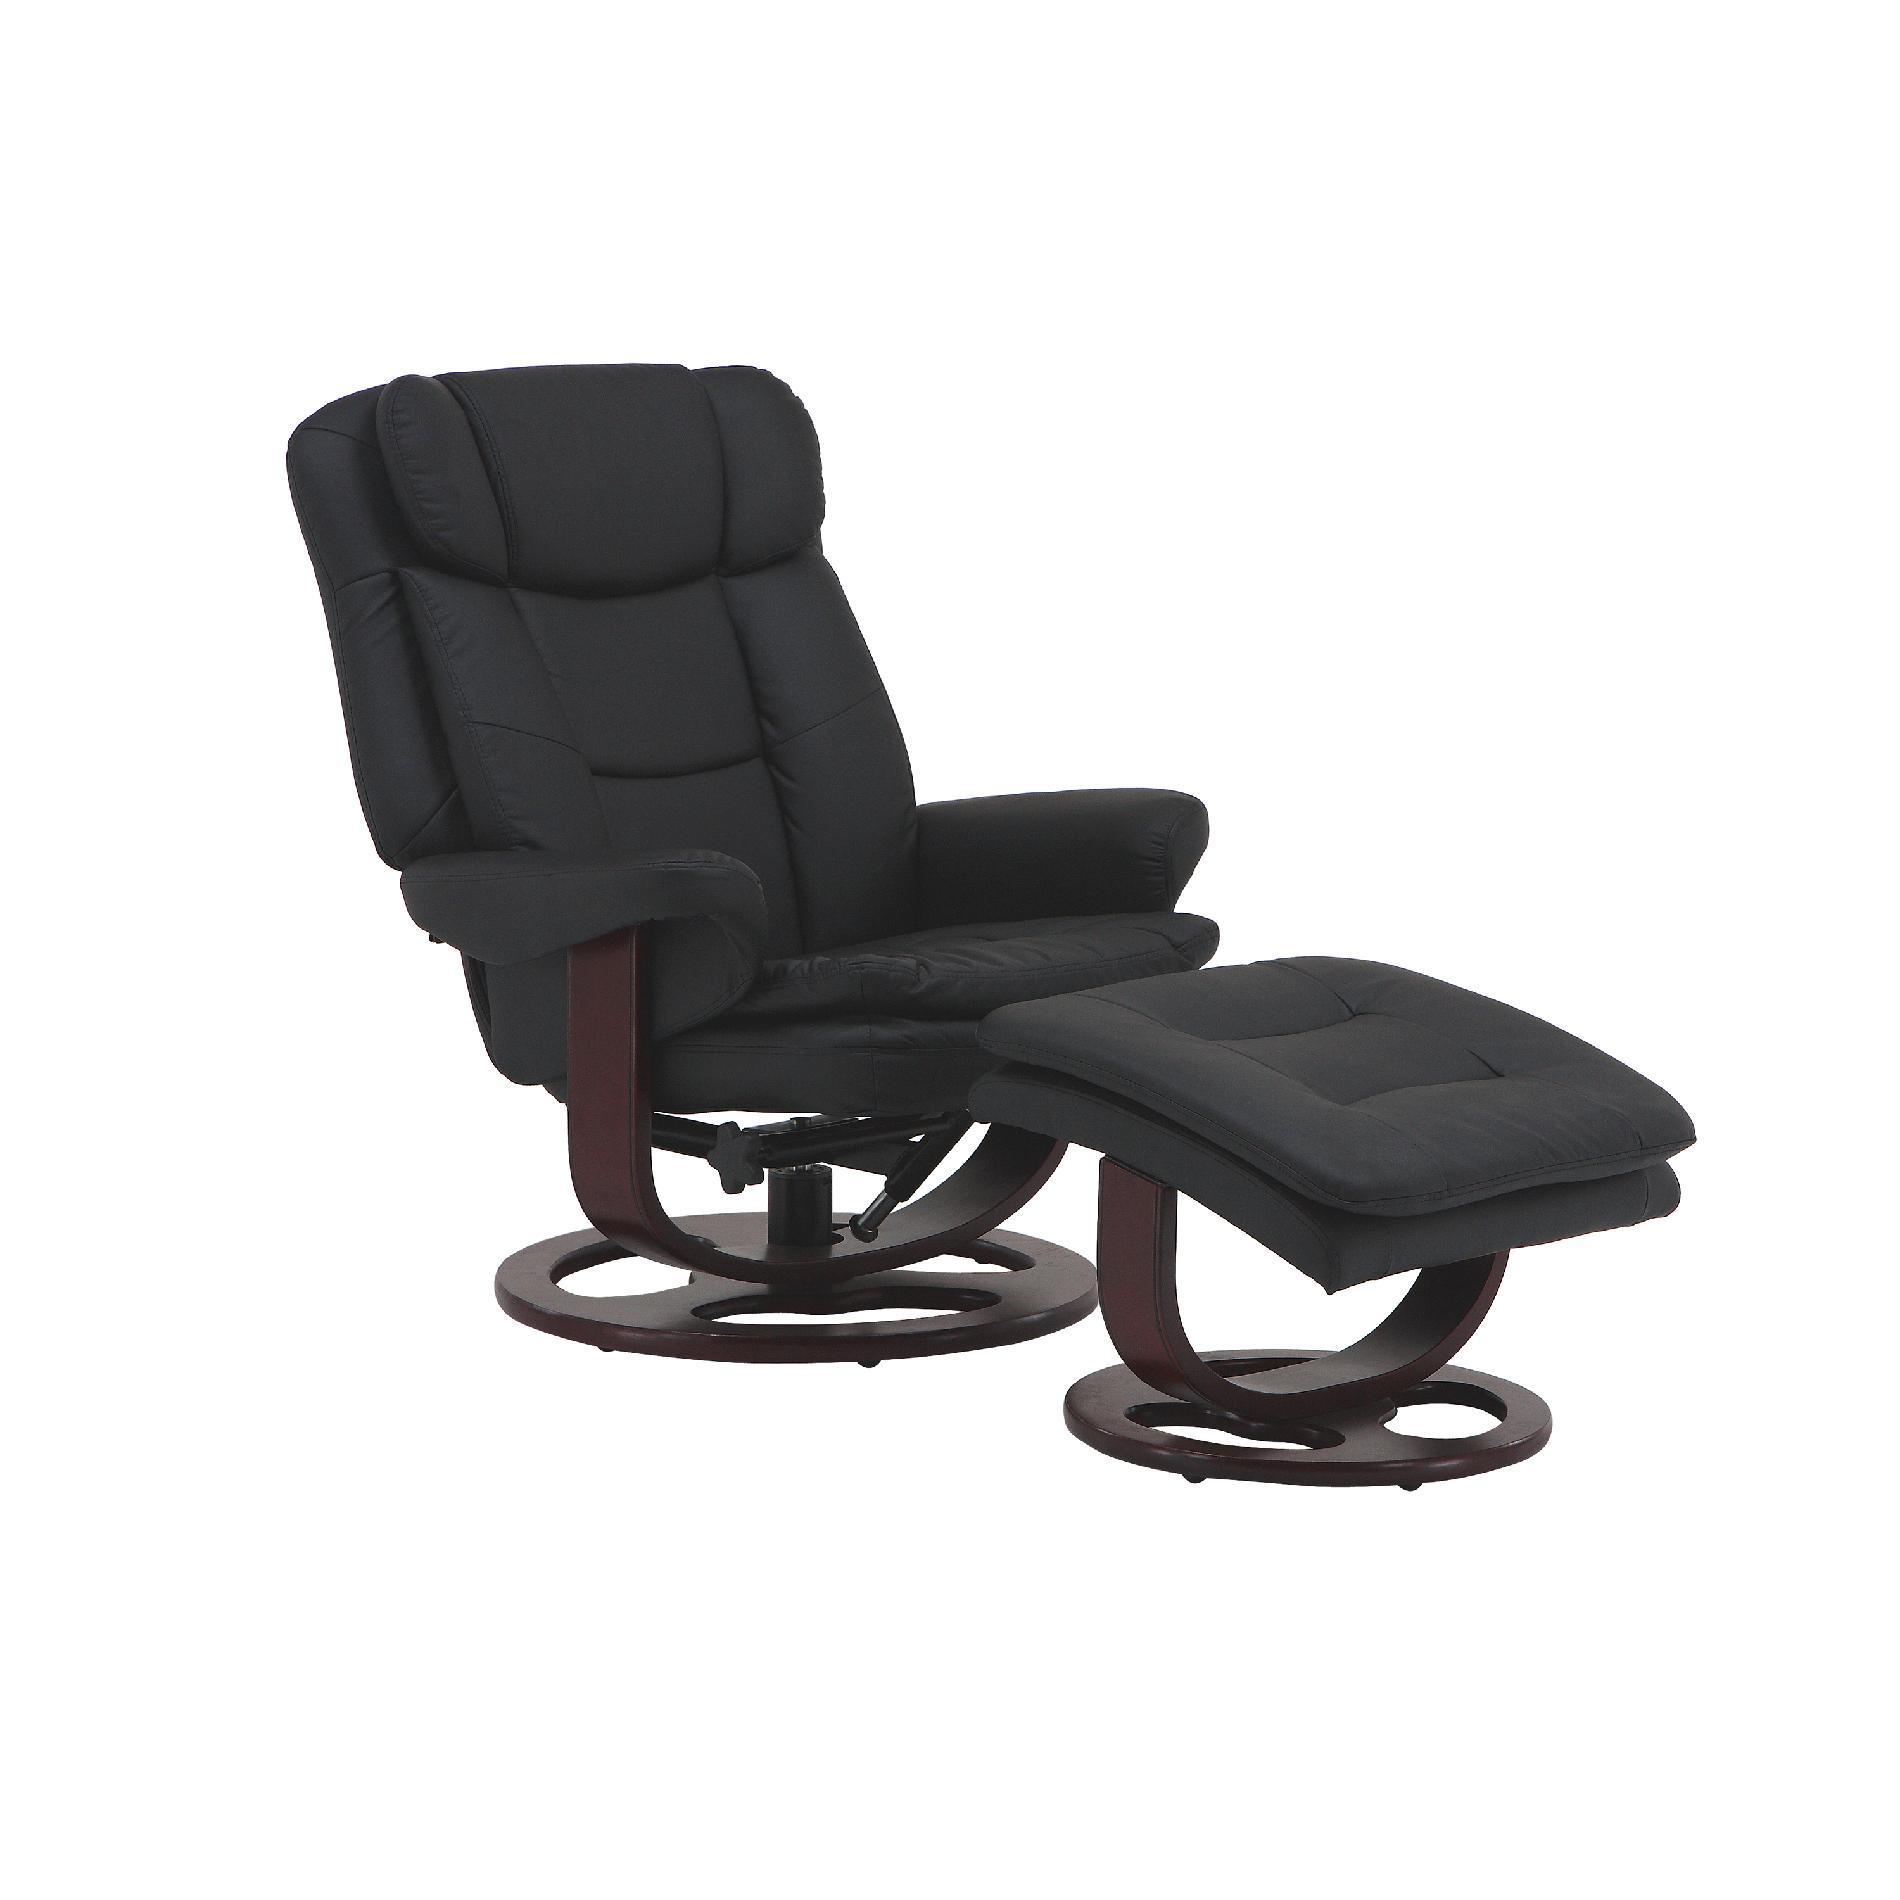 gym chair as seen on tv office ergonomic sale venetian worldwide vw 125620 bk the reclining